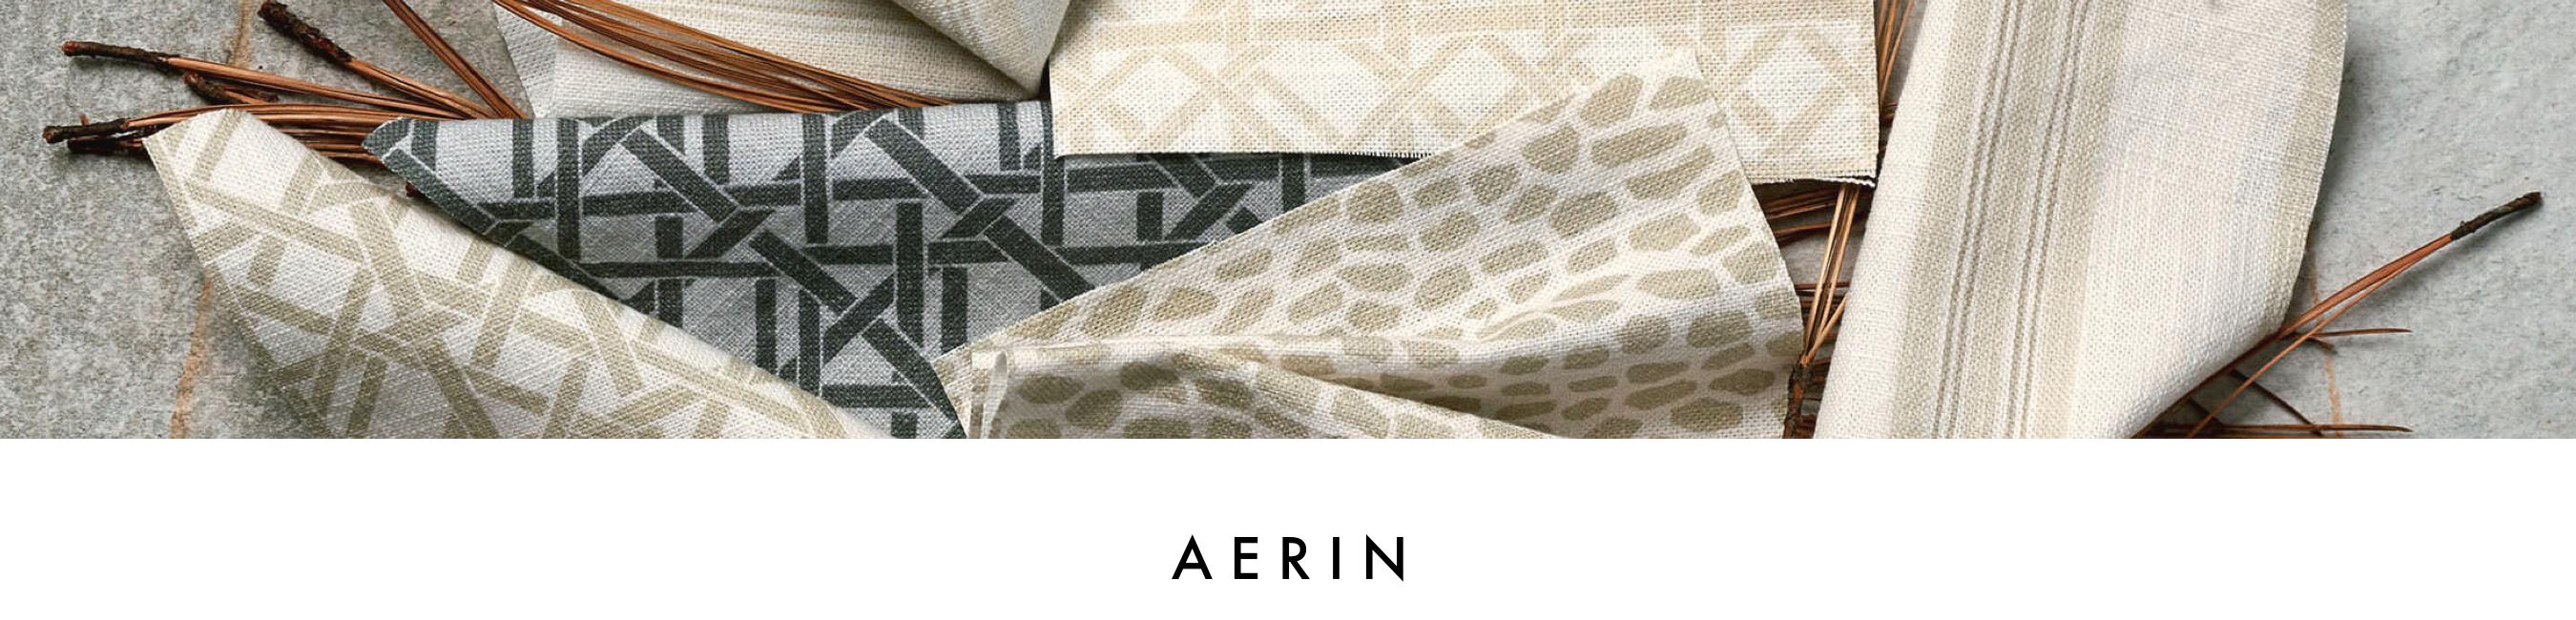 AERIN